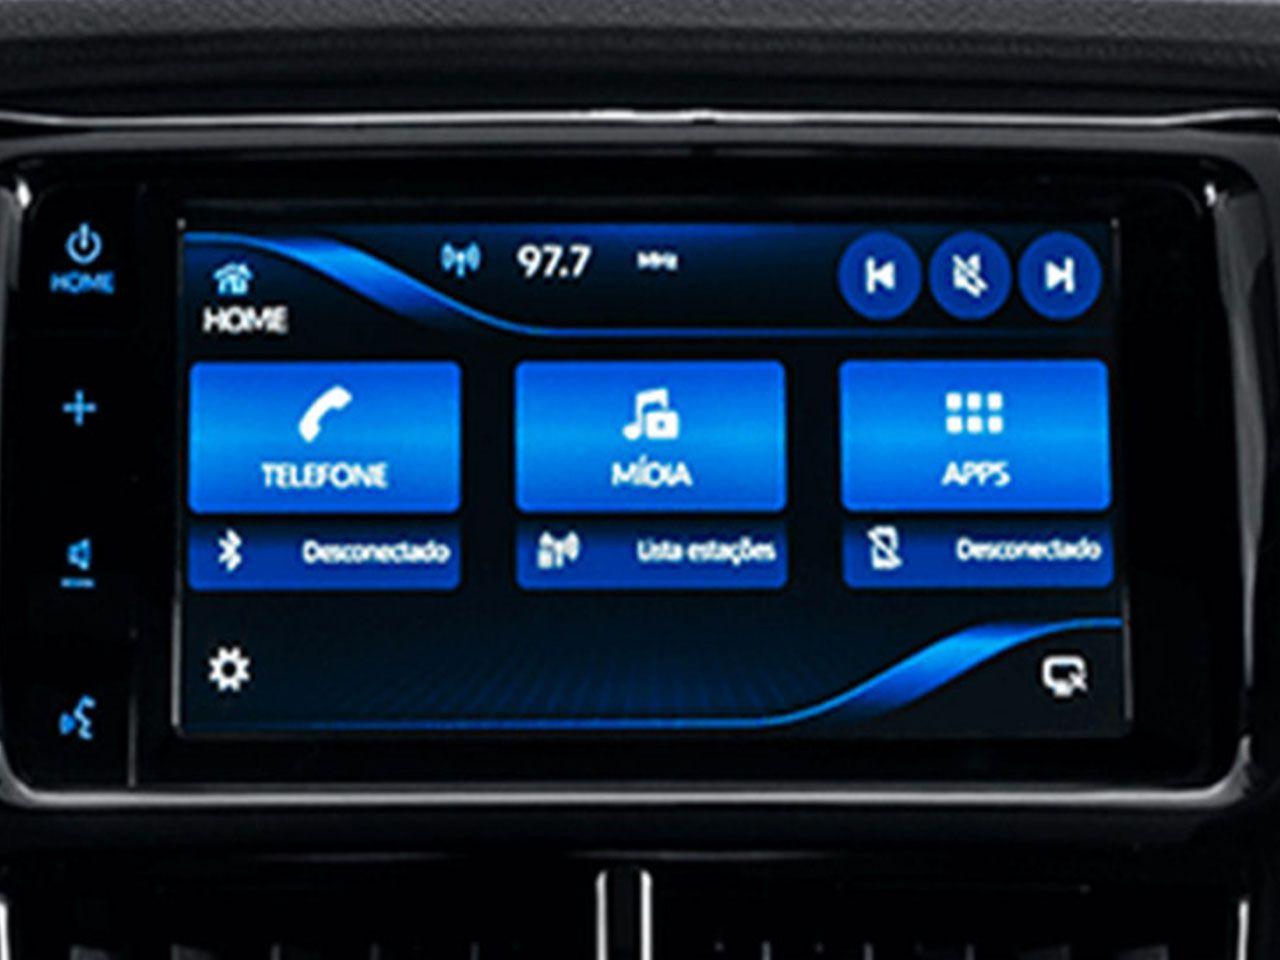 Central Multimídia Yaris Toyota Play+ Harman  - Mirai Peças Toyota